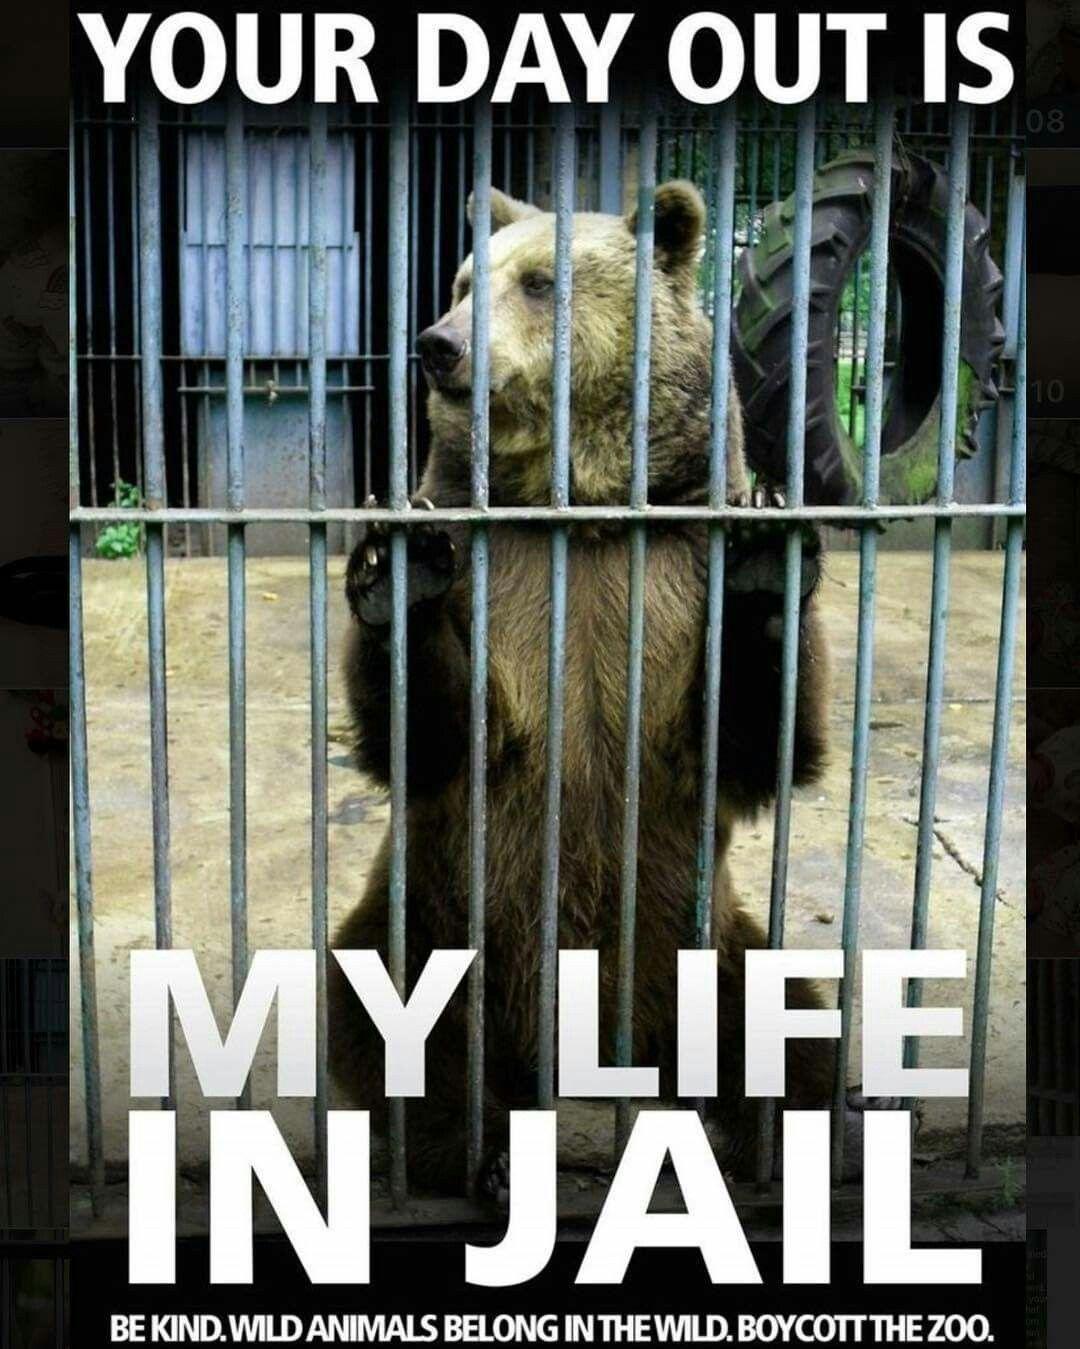 Boo Zoo Animal Quotes Animal Help Animals Wild